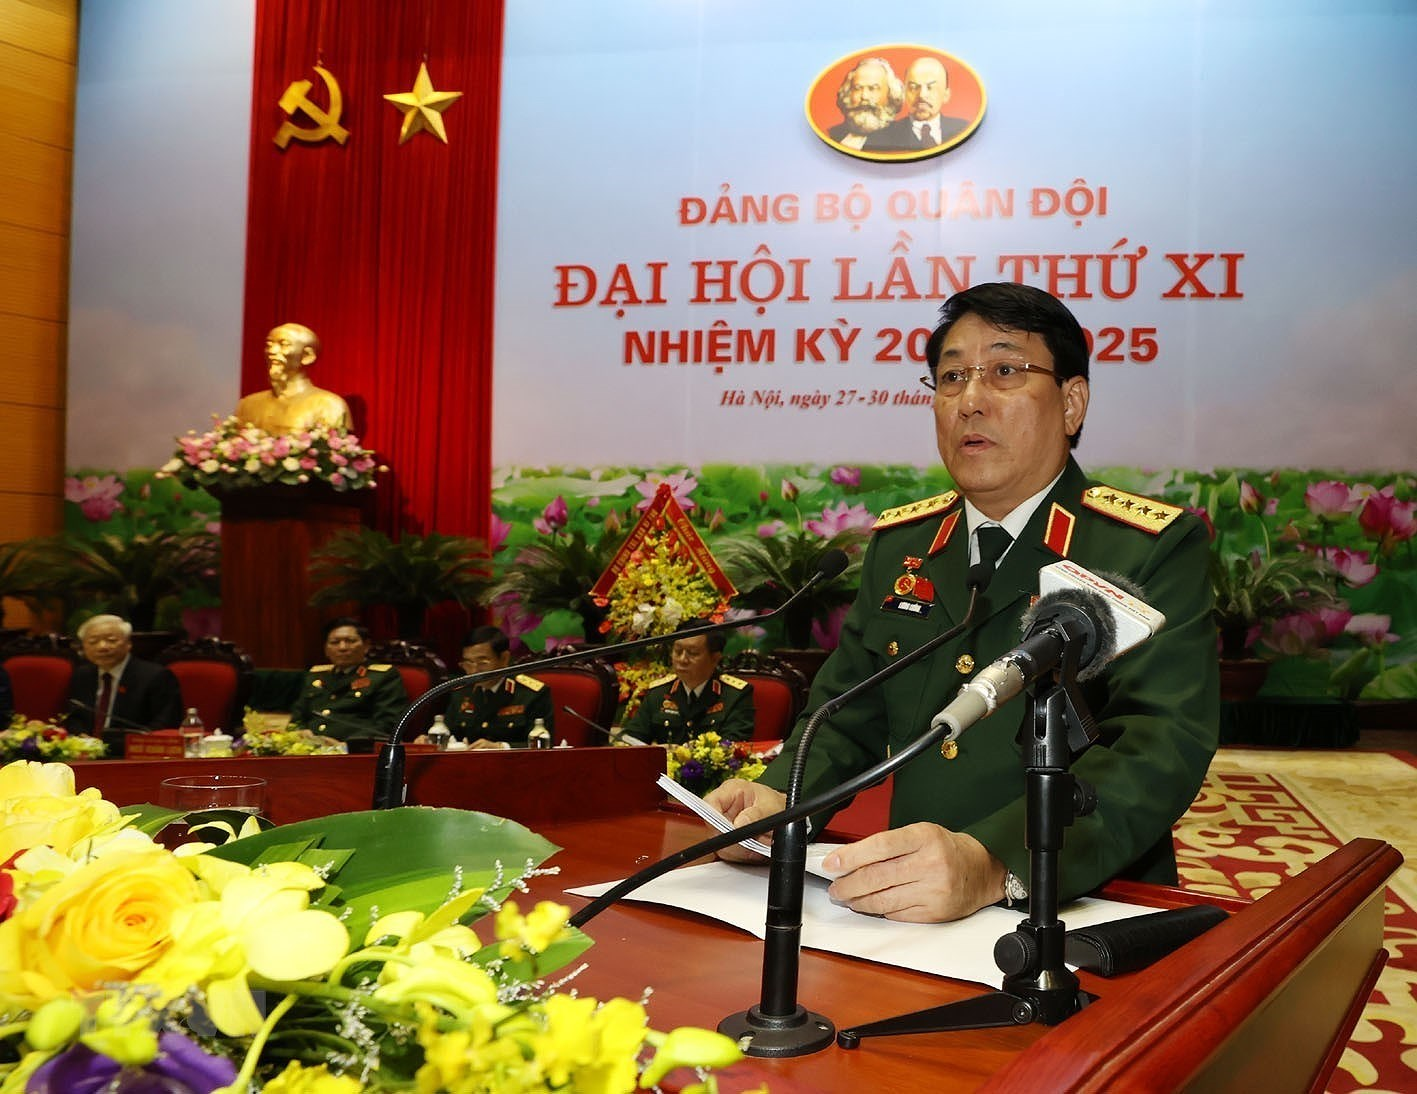 Hinh anh khai mac Dai hoi dai bieu Dang bo Quan doi lan thu XI hinh anh 2